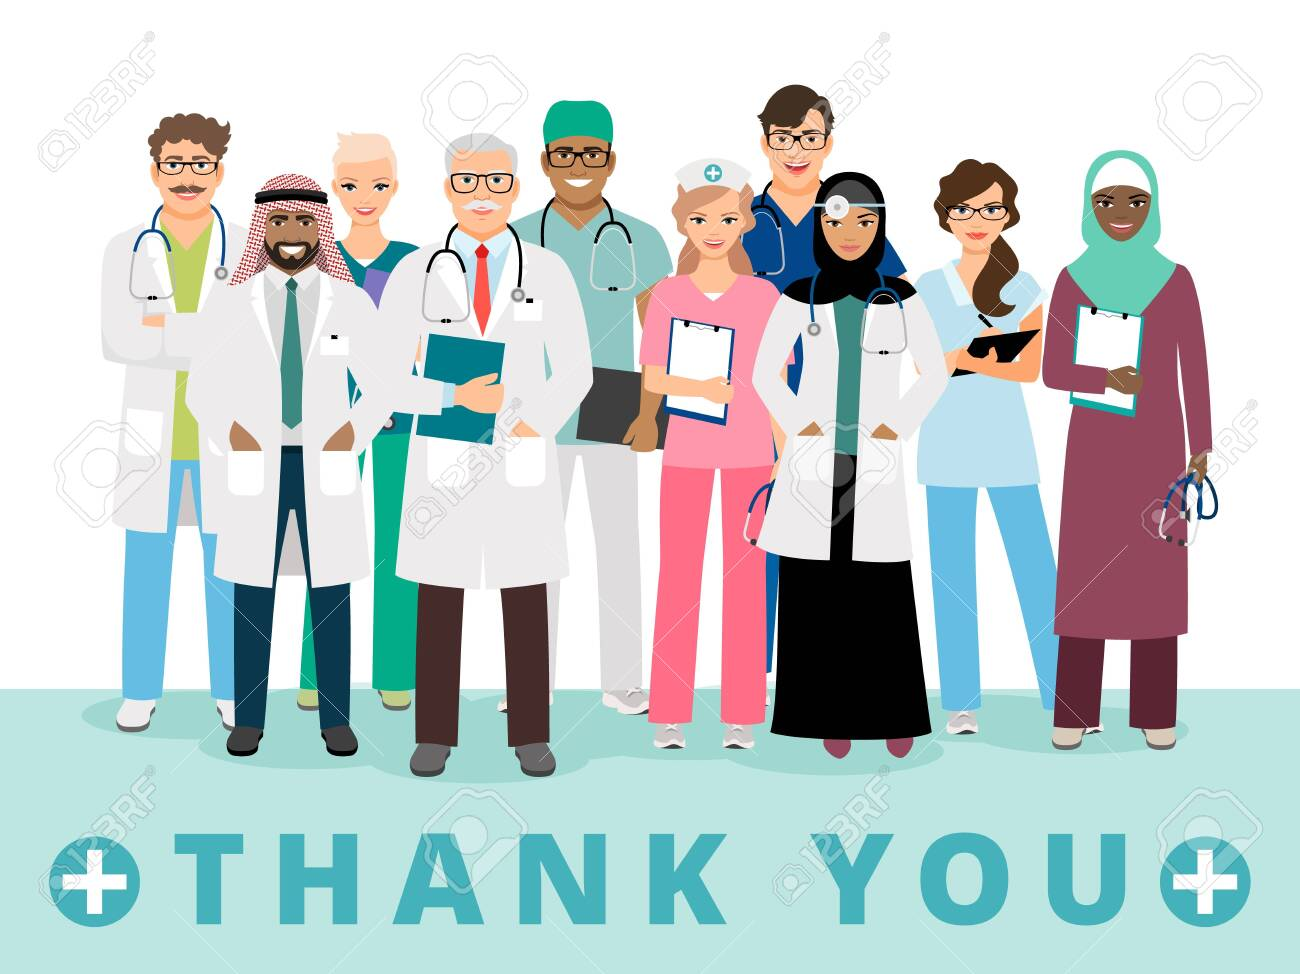 International doctors team. Thanks to medical workers poster. Nurse, emergency healthcare or hospital staff vector illustration - 147366207